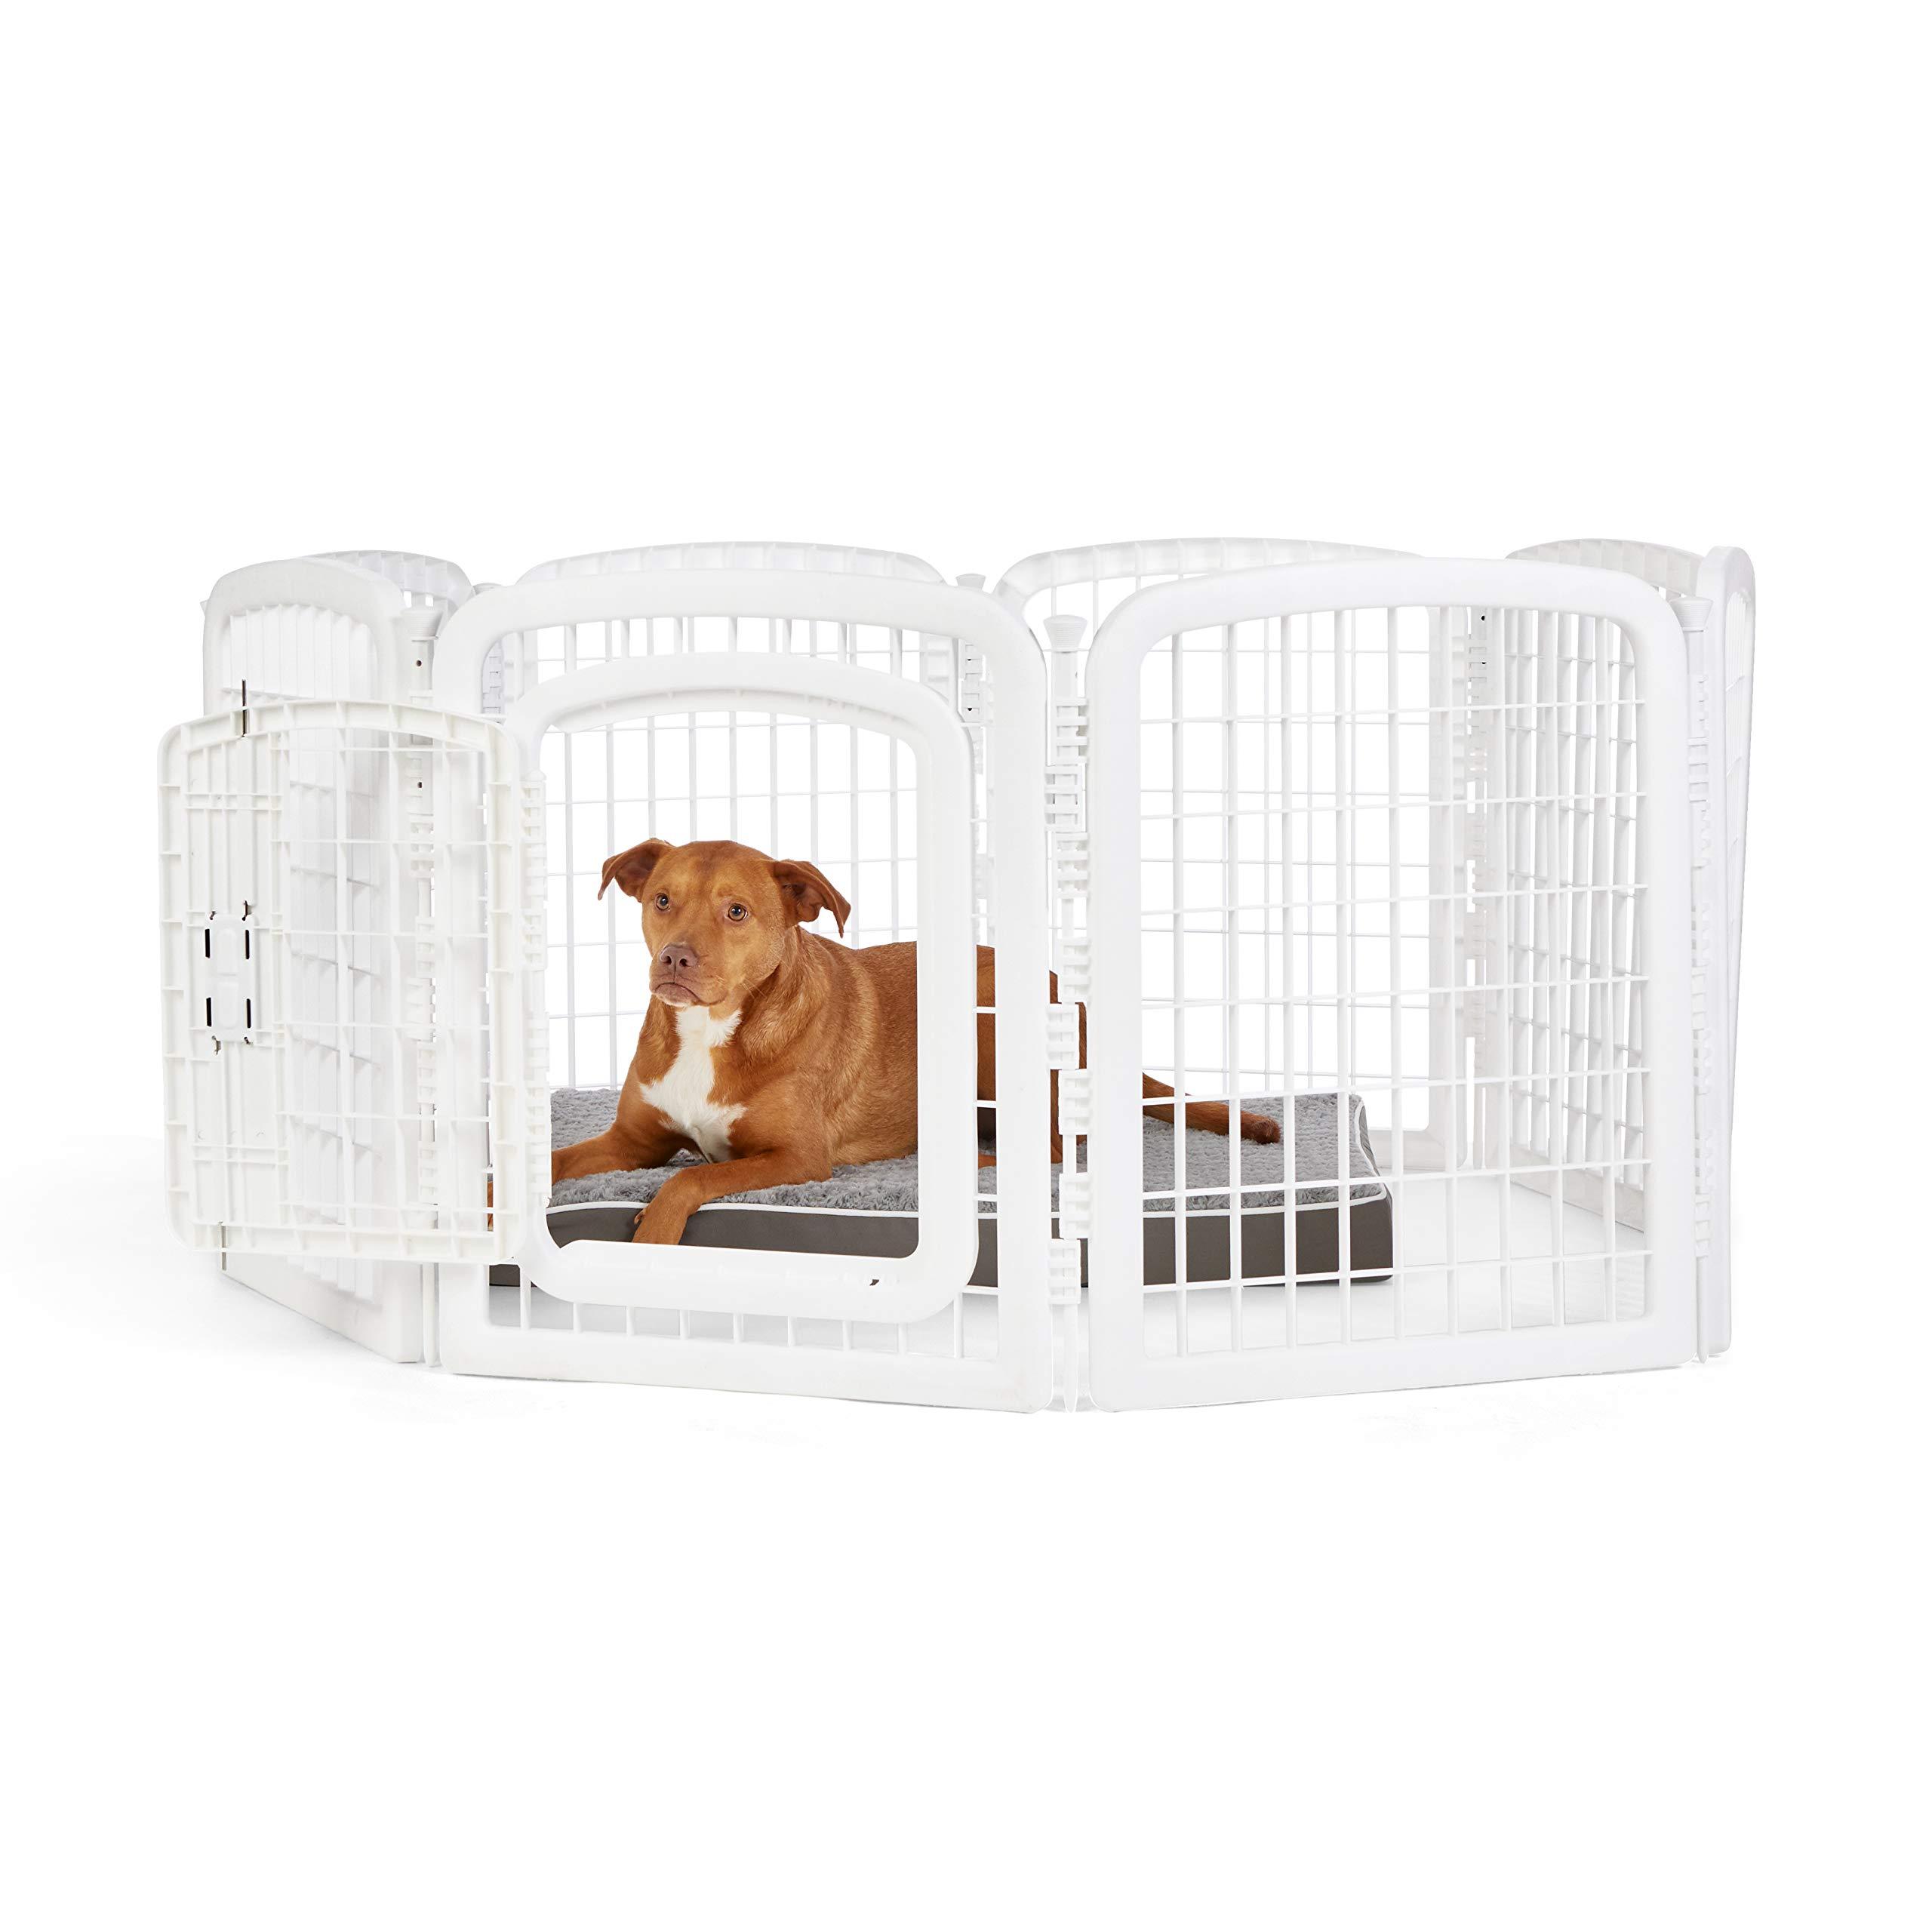 Amazon Basics 8-Panel Plastic Pet Pen Cage Playpen